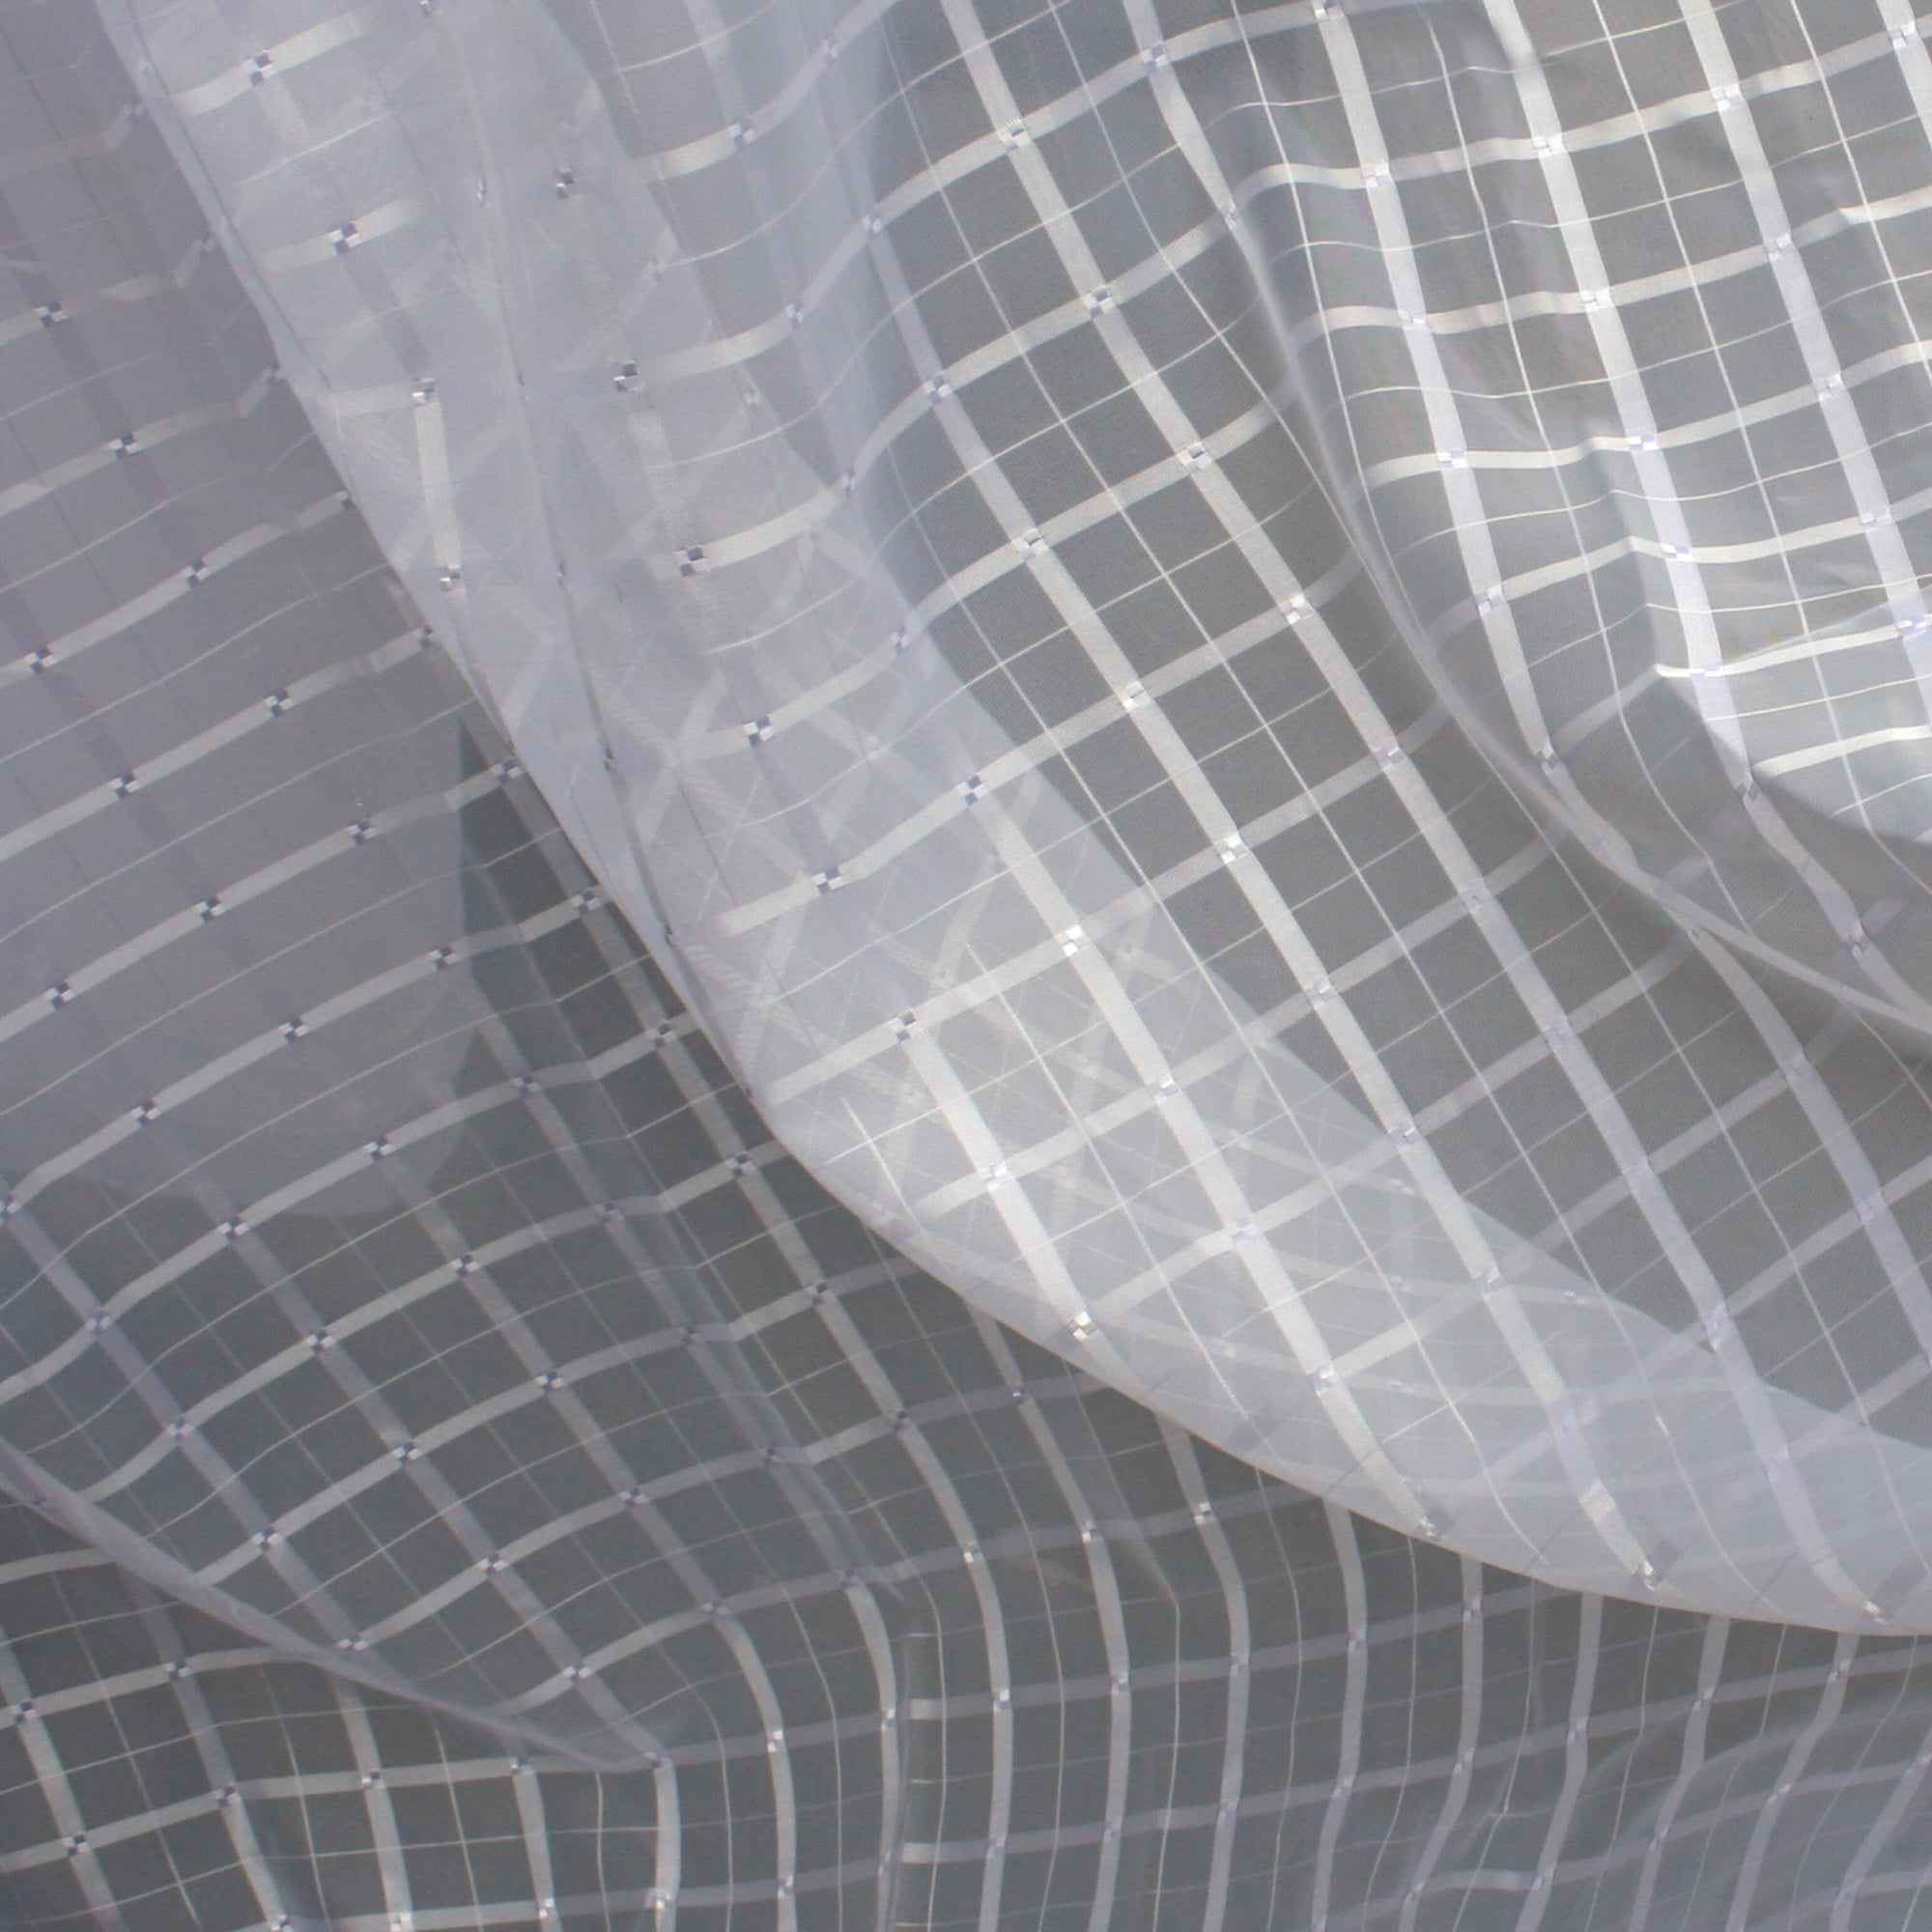 Cortina de Voil Xadrez Branco com Forro Blackout 100% 5,00 x 2,60m - Para Varão com Ilhós Branco (R)